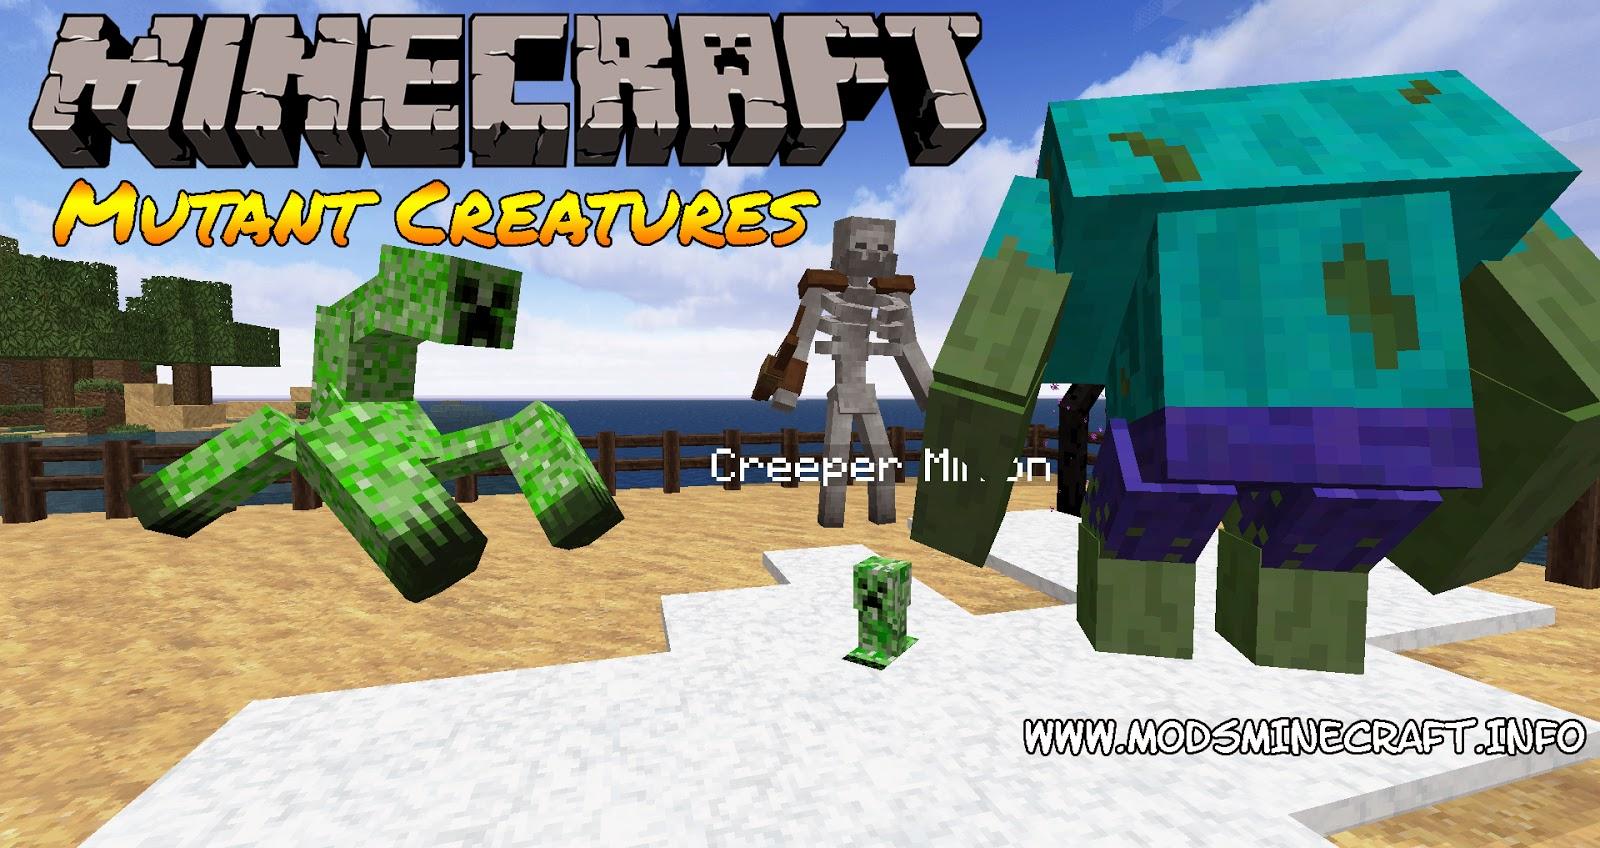 Mutant Creaturas Mod para Minecraft 1.7.2, Mutant Creaturas Mod, Mutant Creaturas 1.7.2, minecraft Mutant Creaturas Mod, minecraft Mutant Creaturas 1.7.2, minecraft 1.7.2, minecraft mods 1.7.2, mods para minecraft, mods para minecraft 1.7.2, mods minecraft, minecraft mods, cómo instalar mods, cómo instalar mods minecraft, minecraft cómo instalar mods